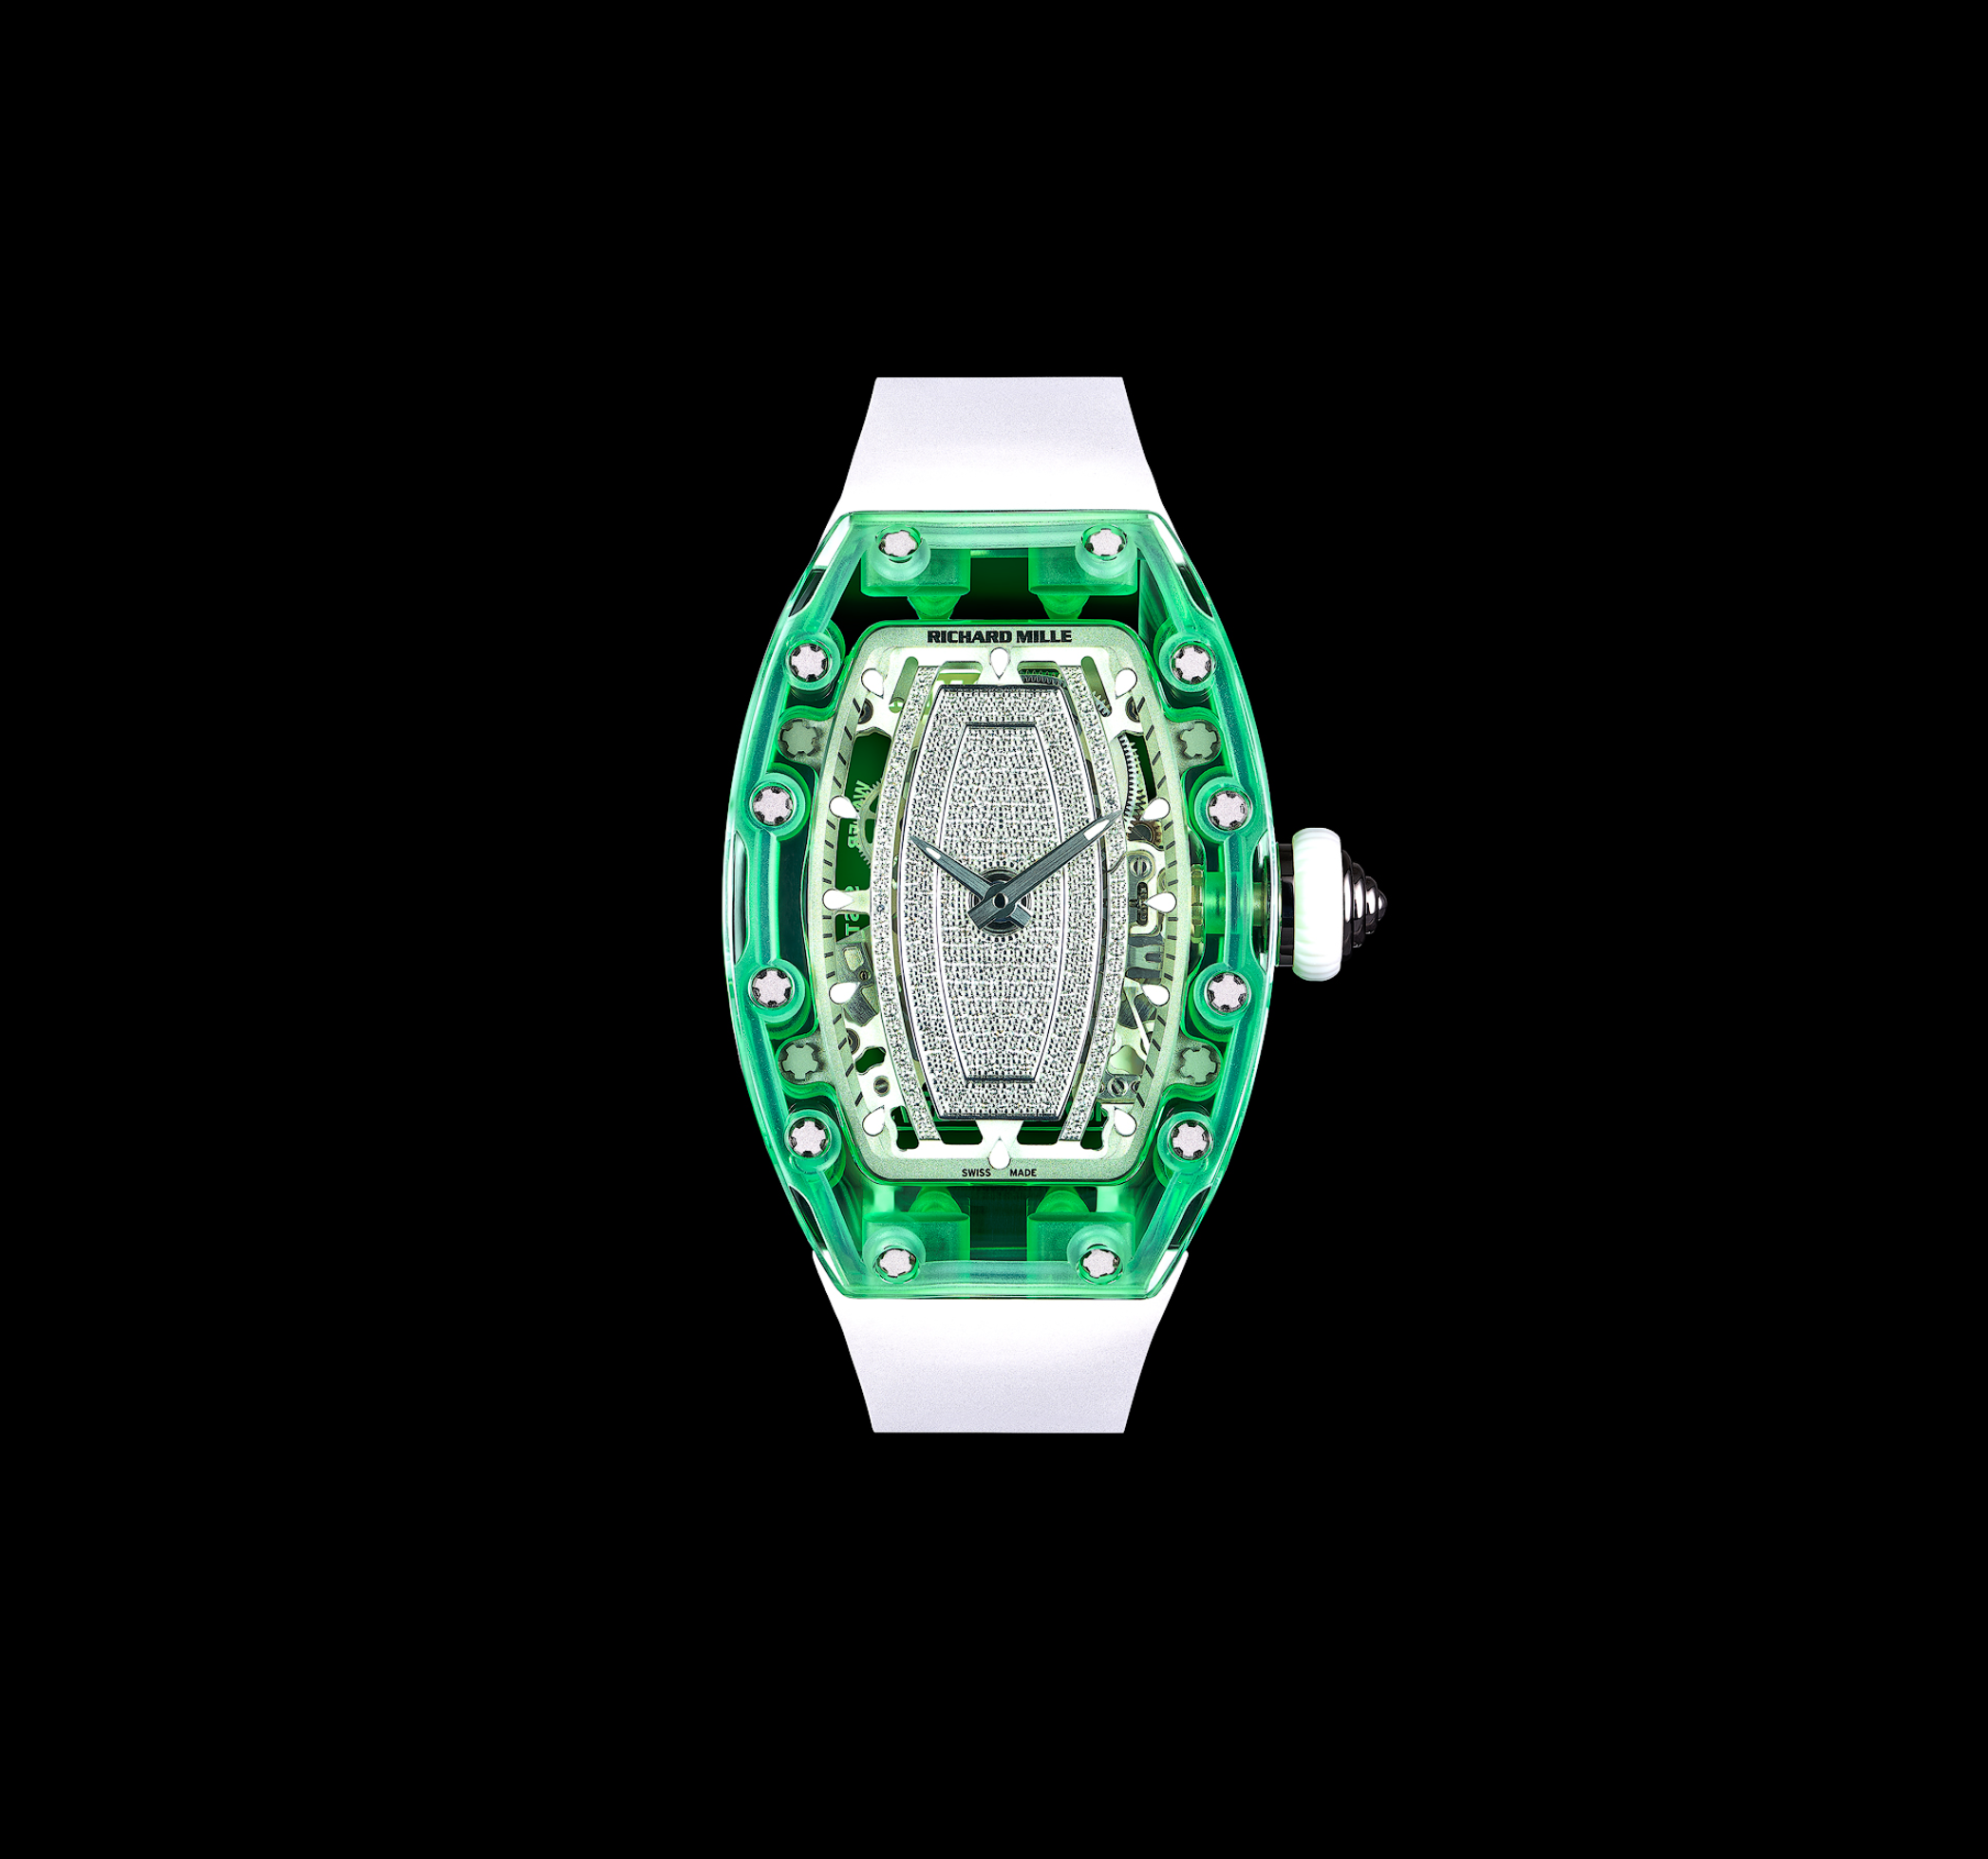 Andre Duman: Richard Mille Timepieces